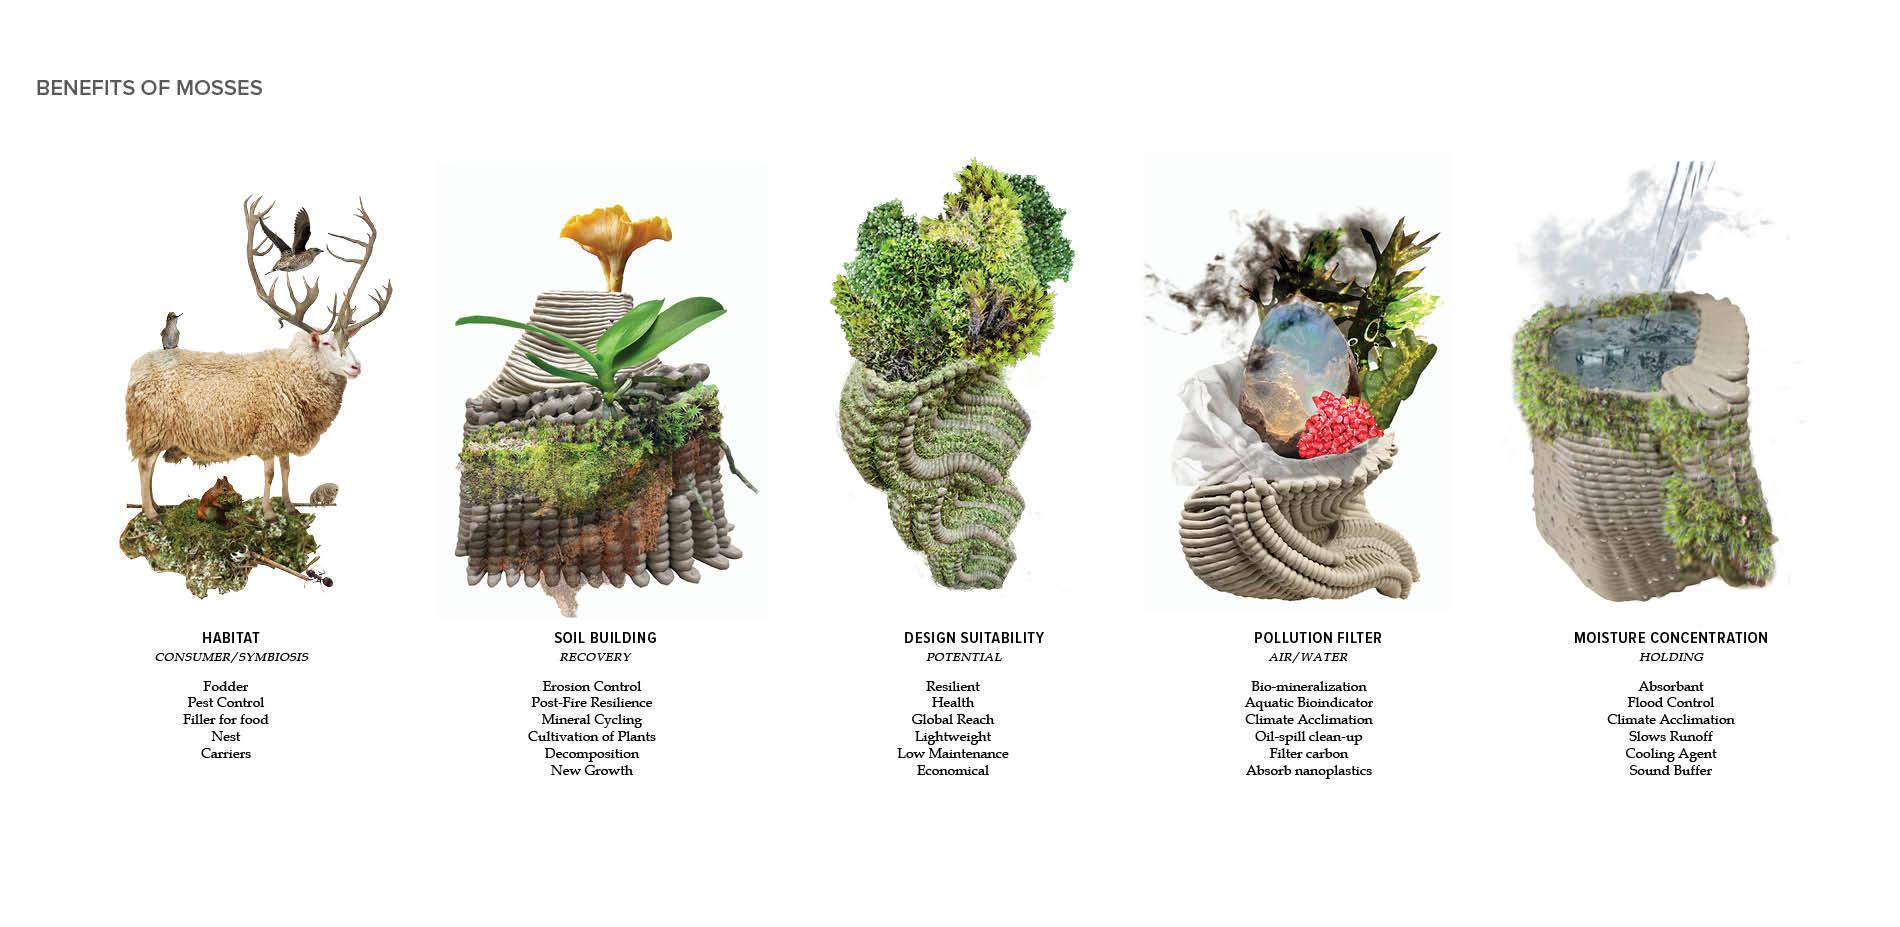 Benefits of Mosses